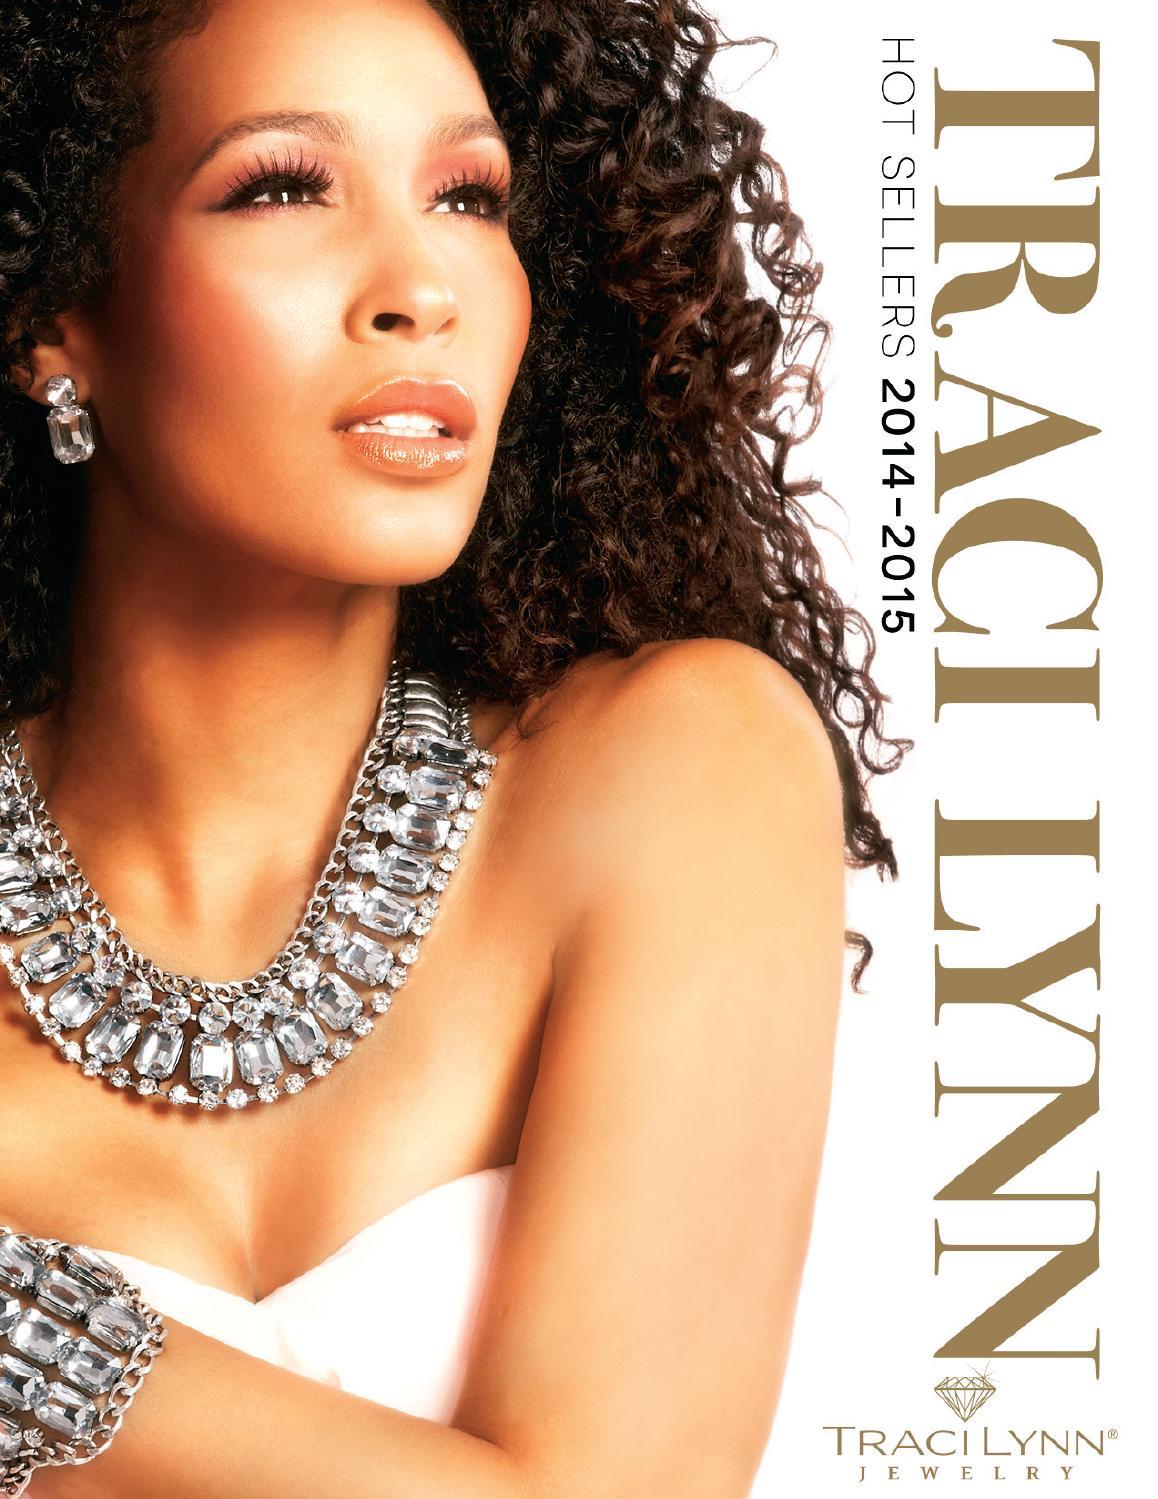 Hot sellers 2014 by traci lynn jewelry issuu